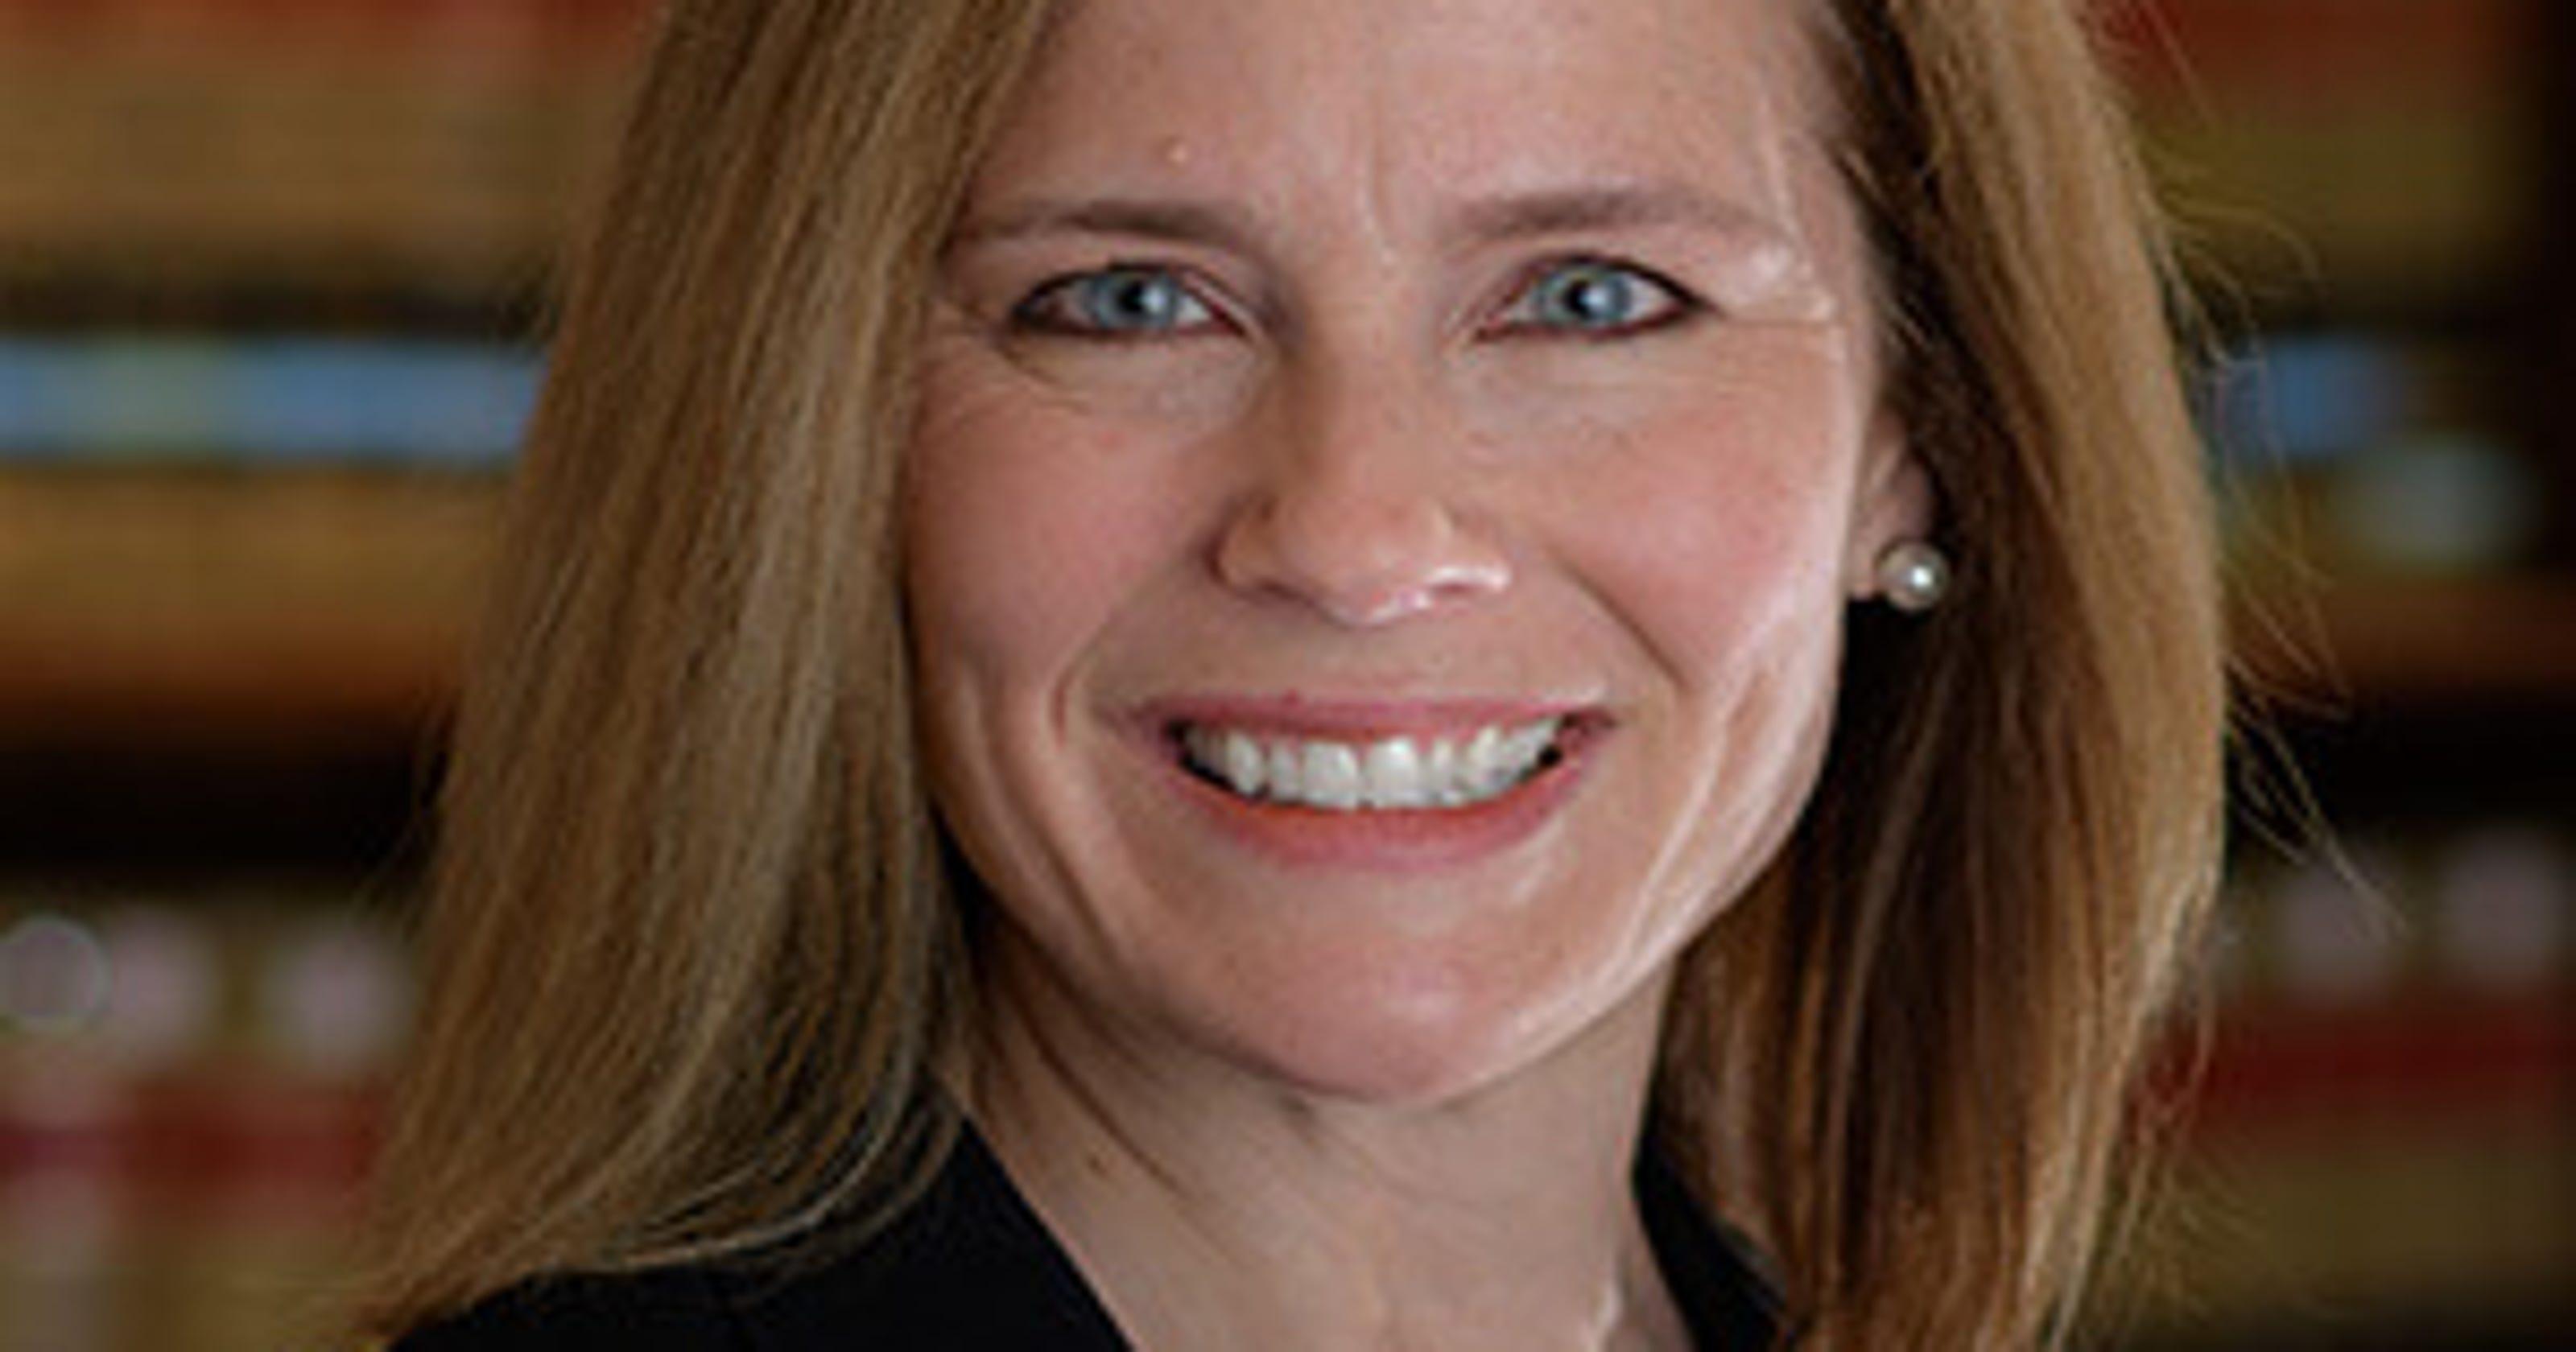 Amy Coney Barrett on list of Supreme Court candidates